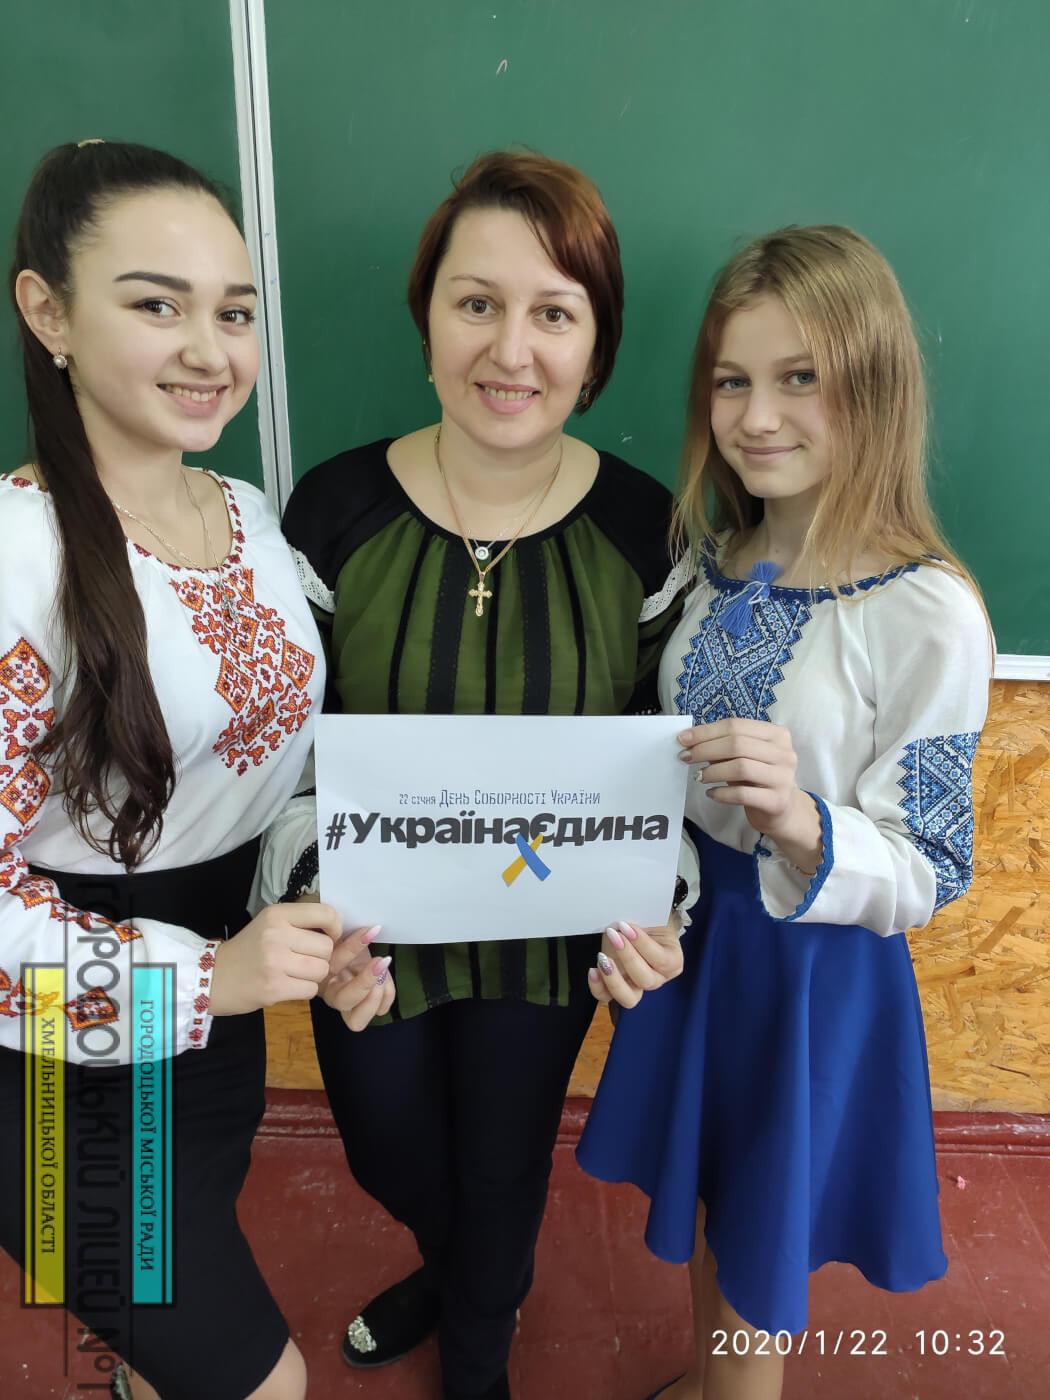 IMG 20200122 103205 e1579705181893 - День Соборності України